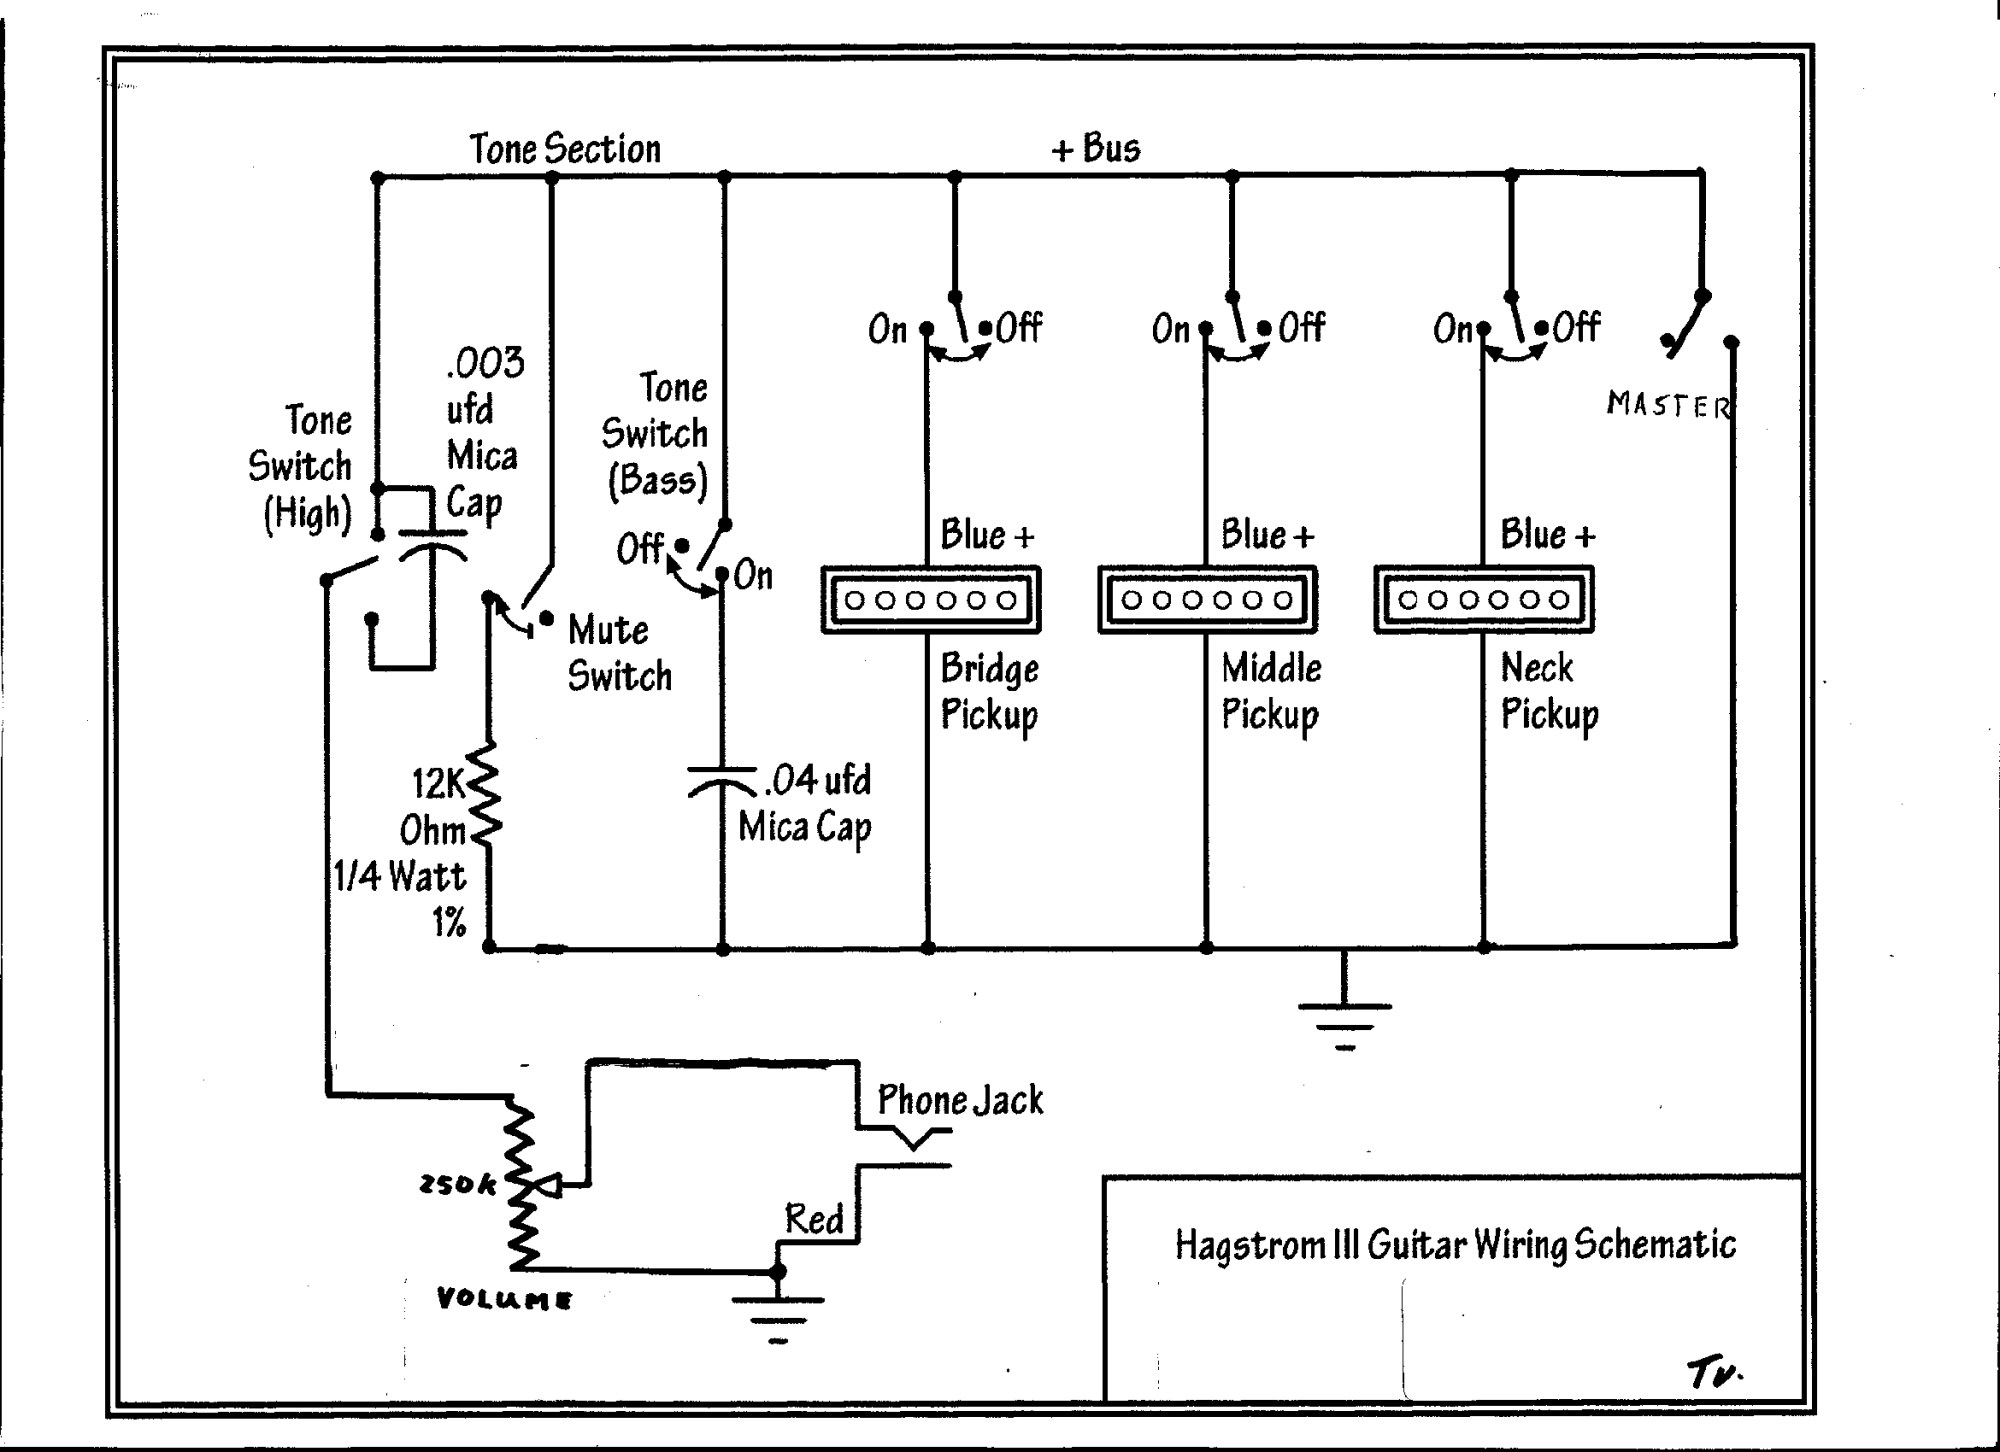 hight resolution of hagstrom wiring diagram trusted wiring diagram krank wiring diagram hagstrom wiring diagrams